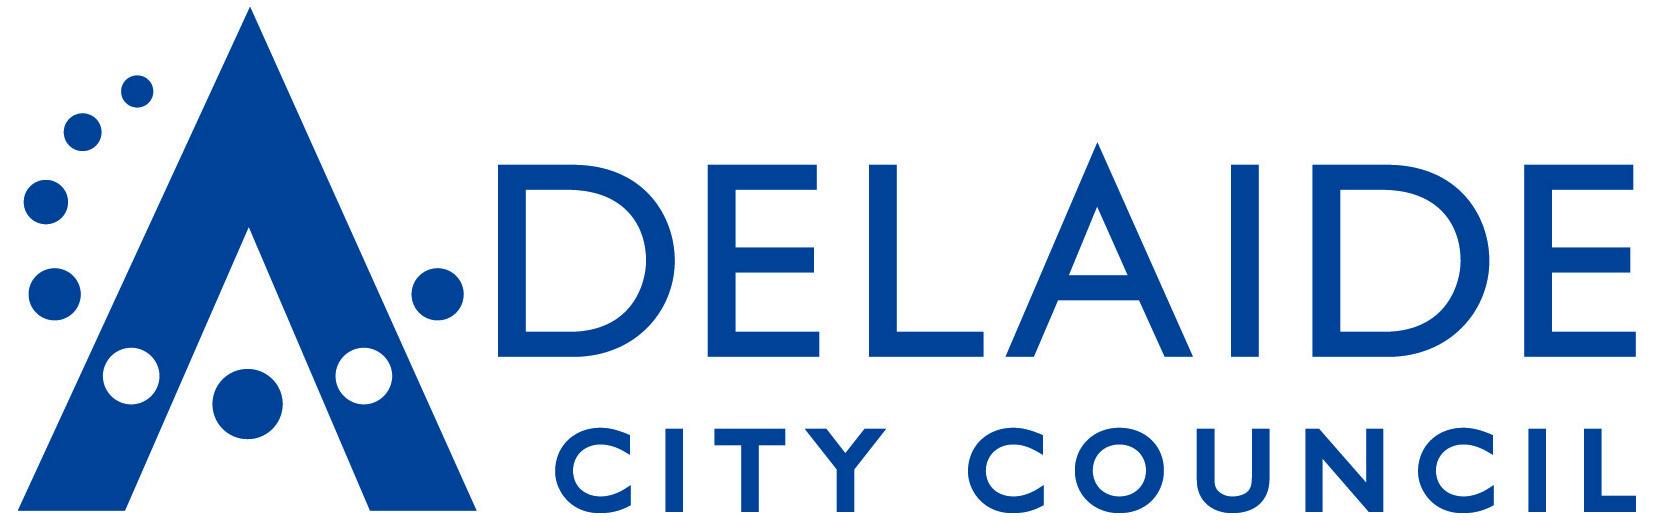 ACC_logo.jpg